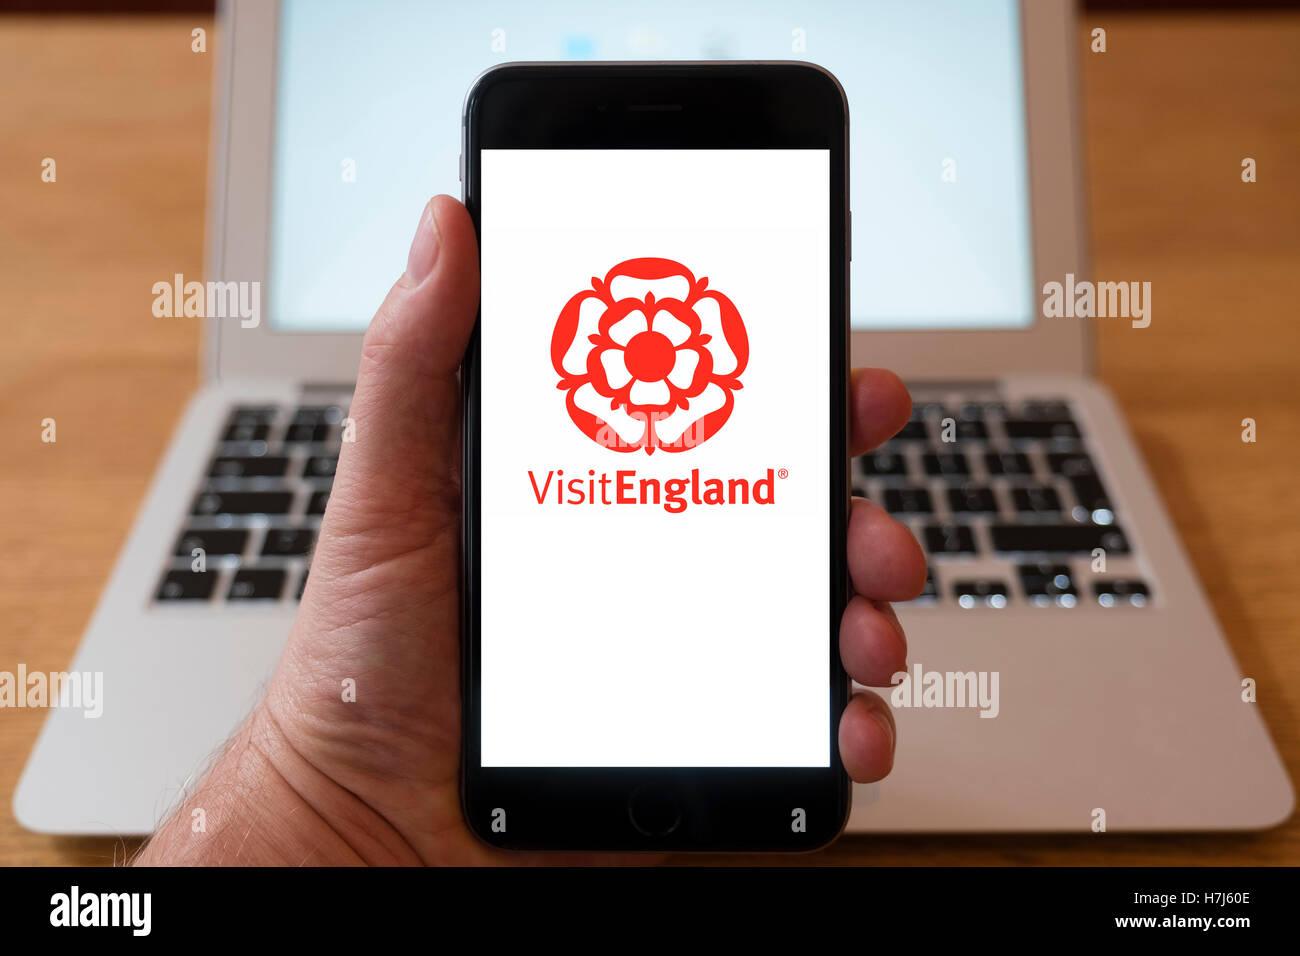 Using iPhone smart phone to display logo of Visit England tourist organisation. - Stock Image